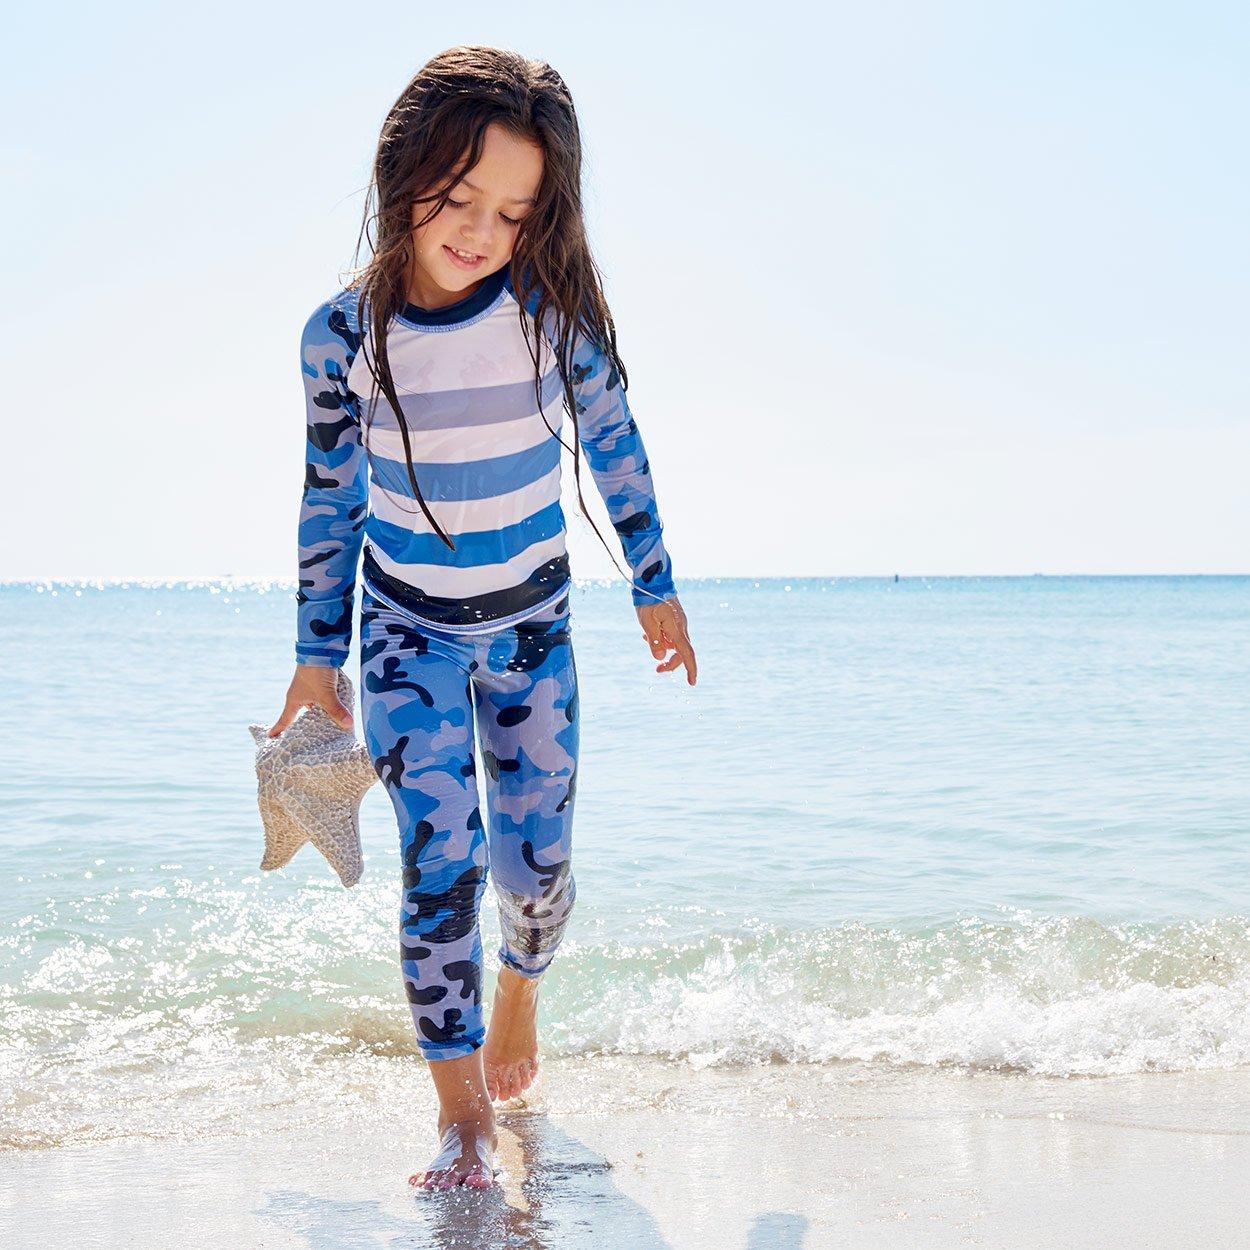 Blue Camo 2Pc Rash Guard Set Girls Shell Found On The Beach Sunpoplife